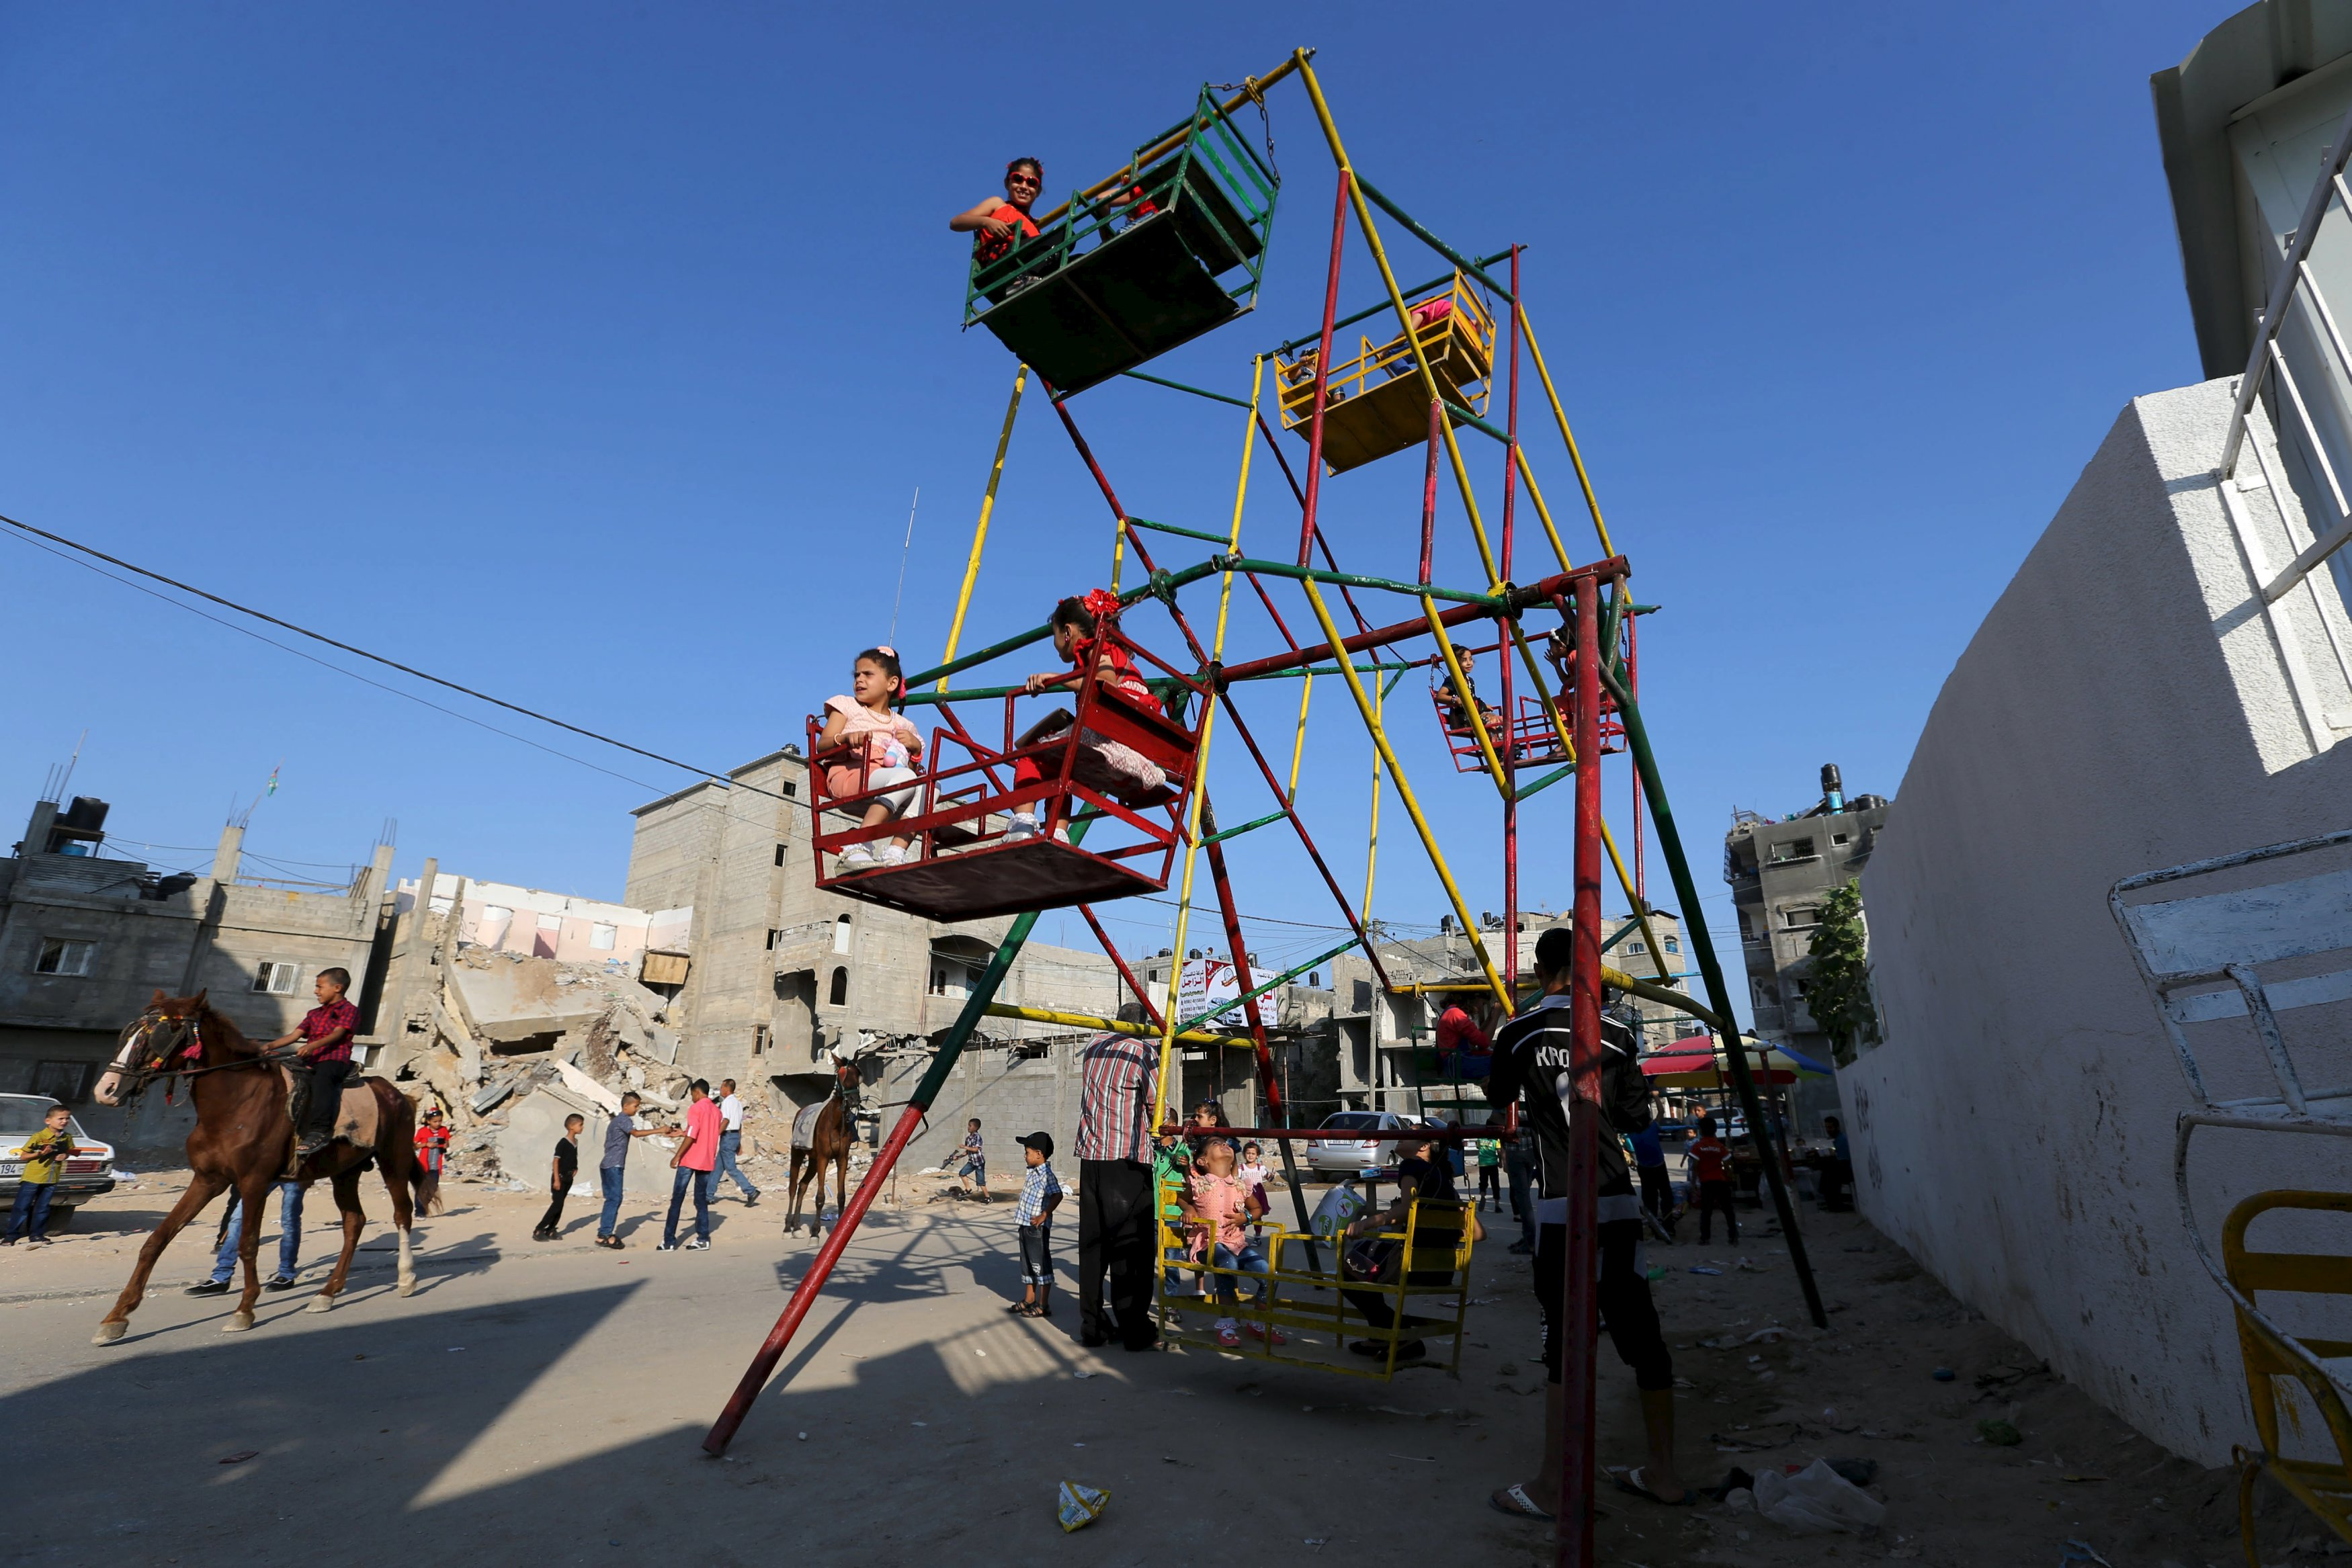 Popular Gaza Eid Al-Fitr 2018 - 7f6f52d5bc7d432fb14b1e1e53ef2746_6  Photograph_587385 .jpeg